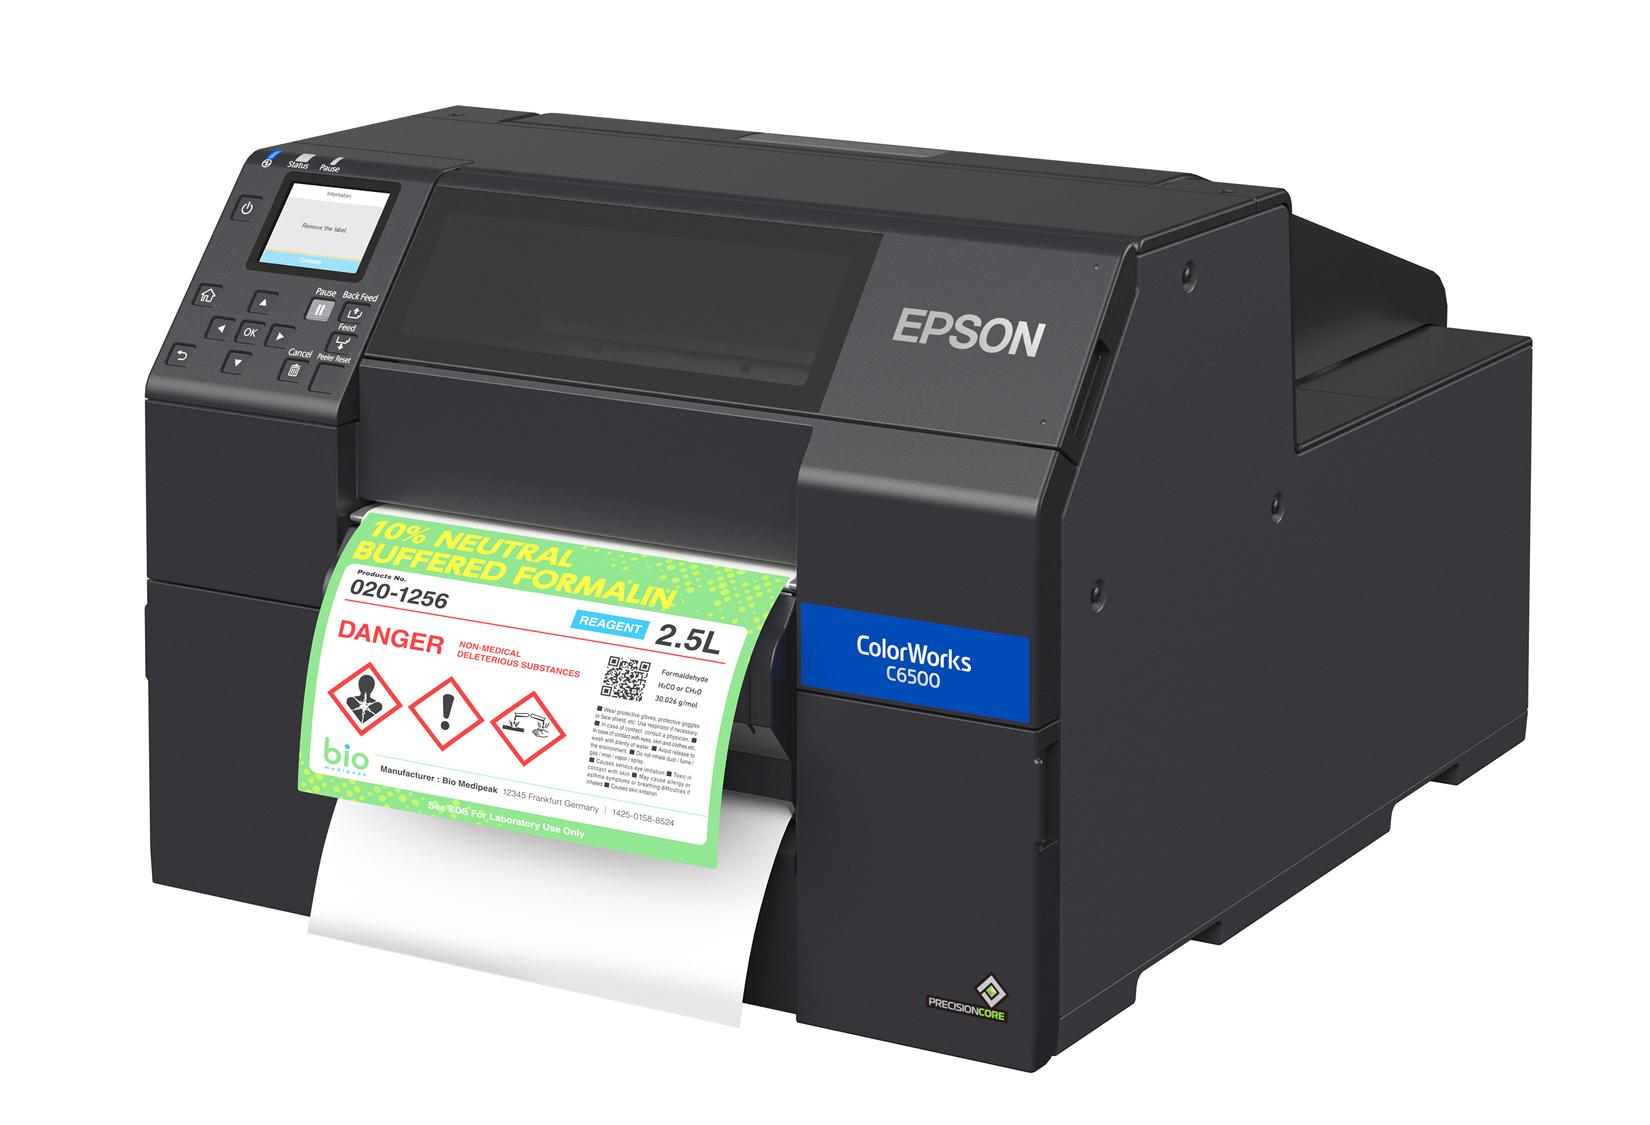 Epson ColorWorks C6500P (Peeler Version) on Sale Now